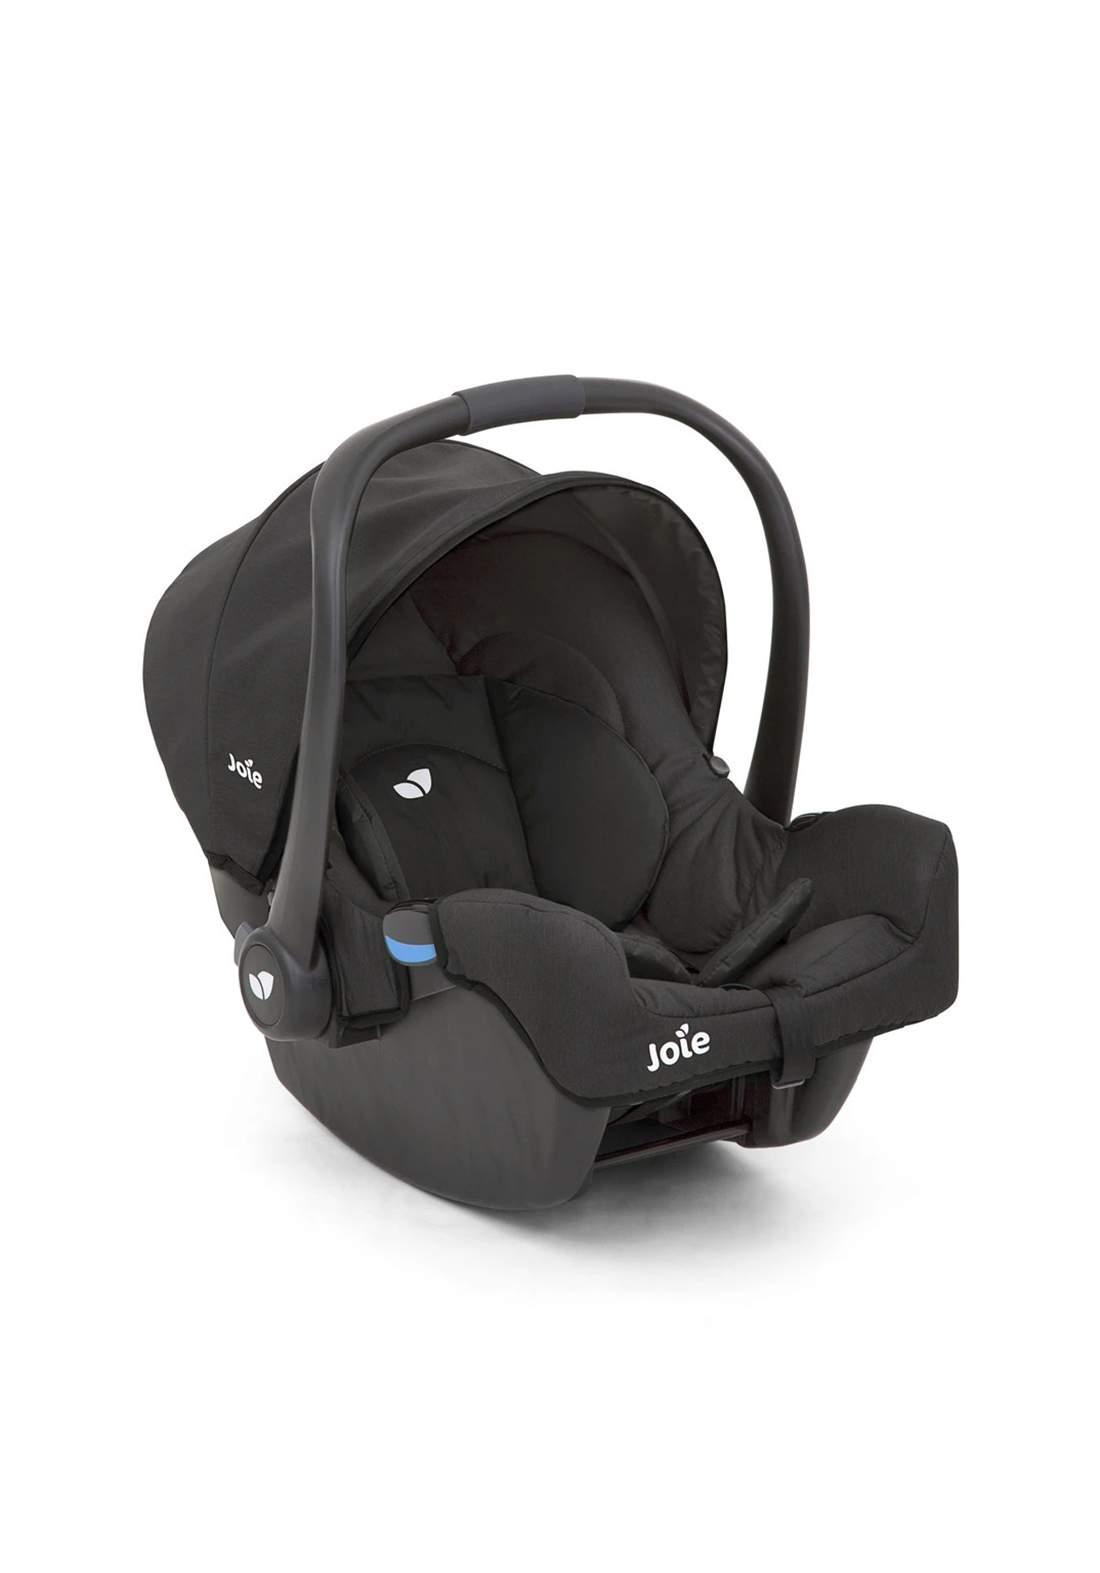 مقعد سيارة للاطفال Joie Baby Gemm Chromium Car Seat 13kg(0+M)